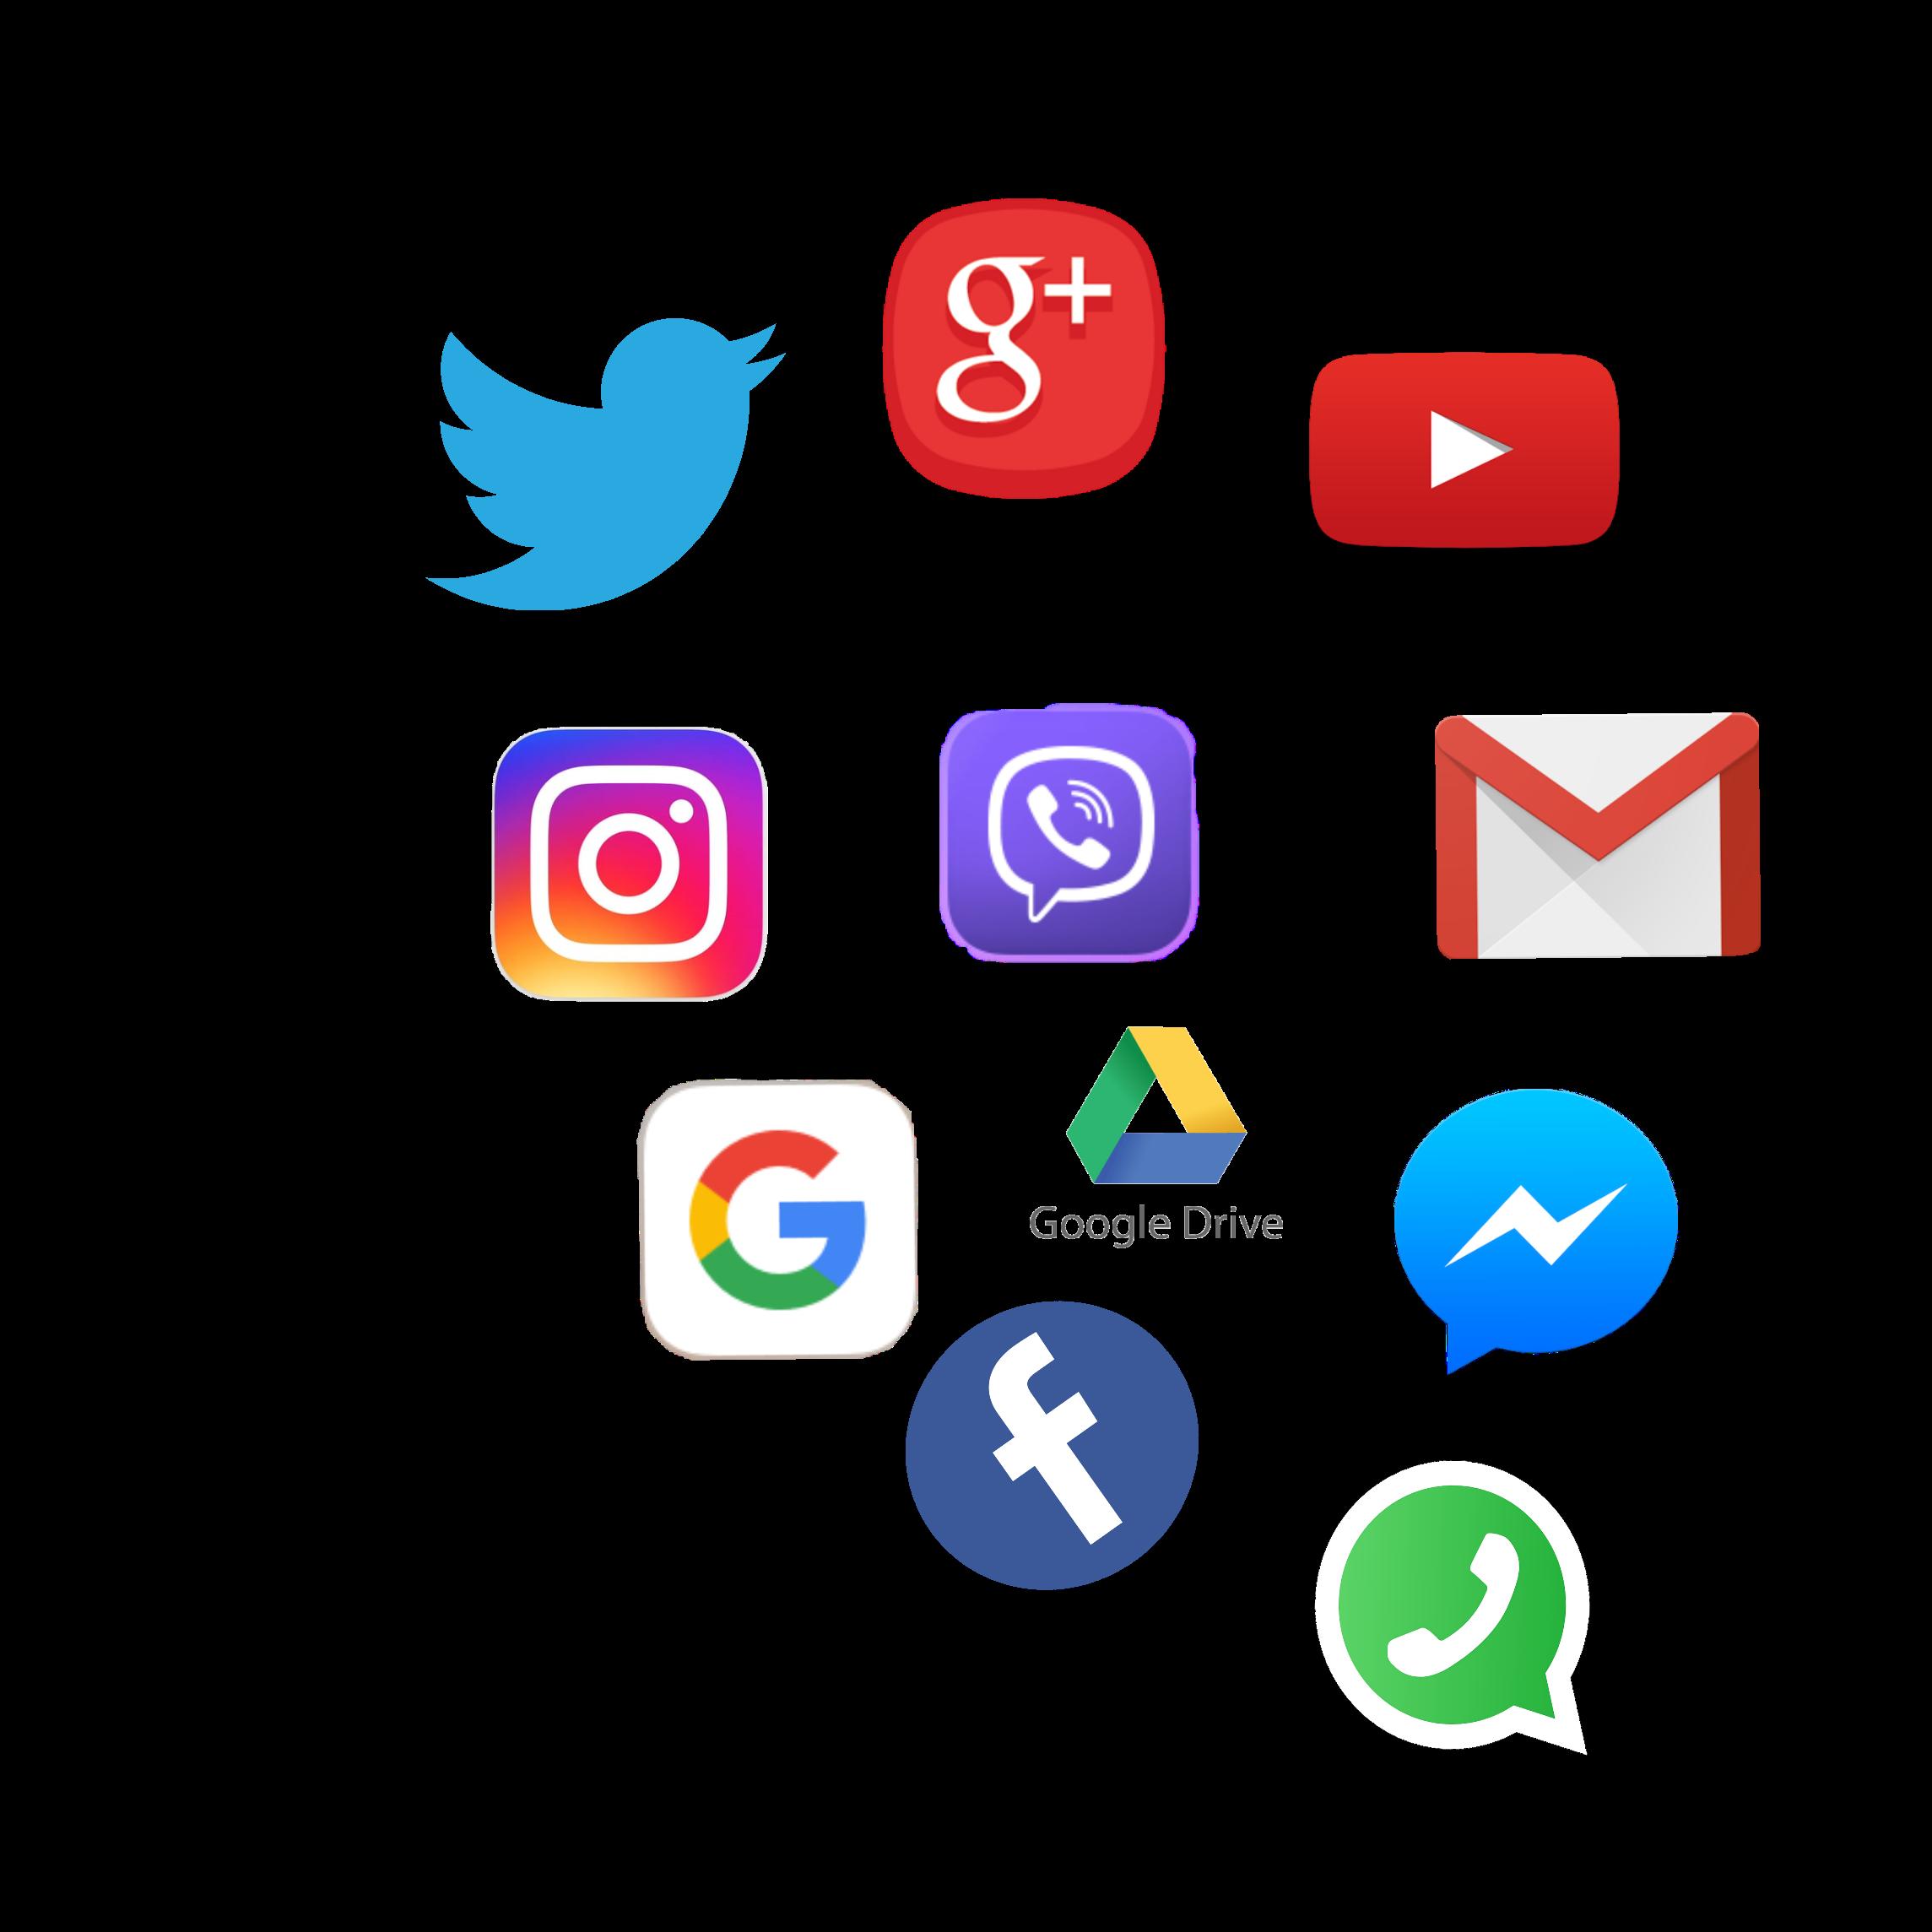 facebook messenger google whatsapp yahoo gmail youtube.